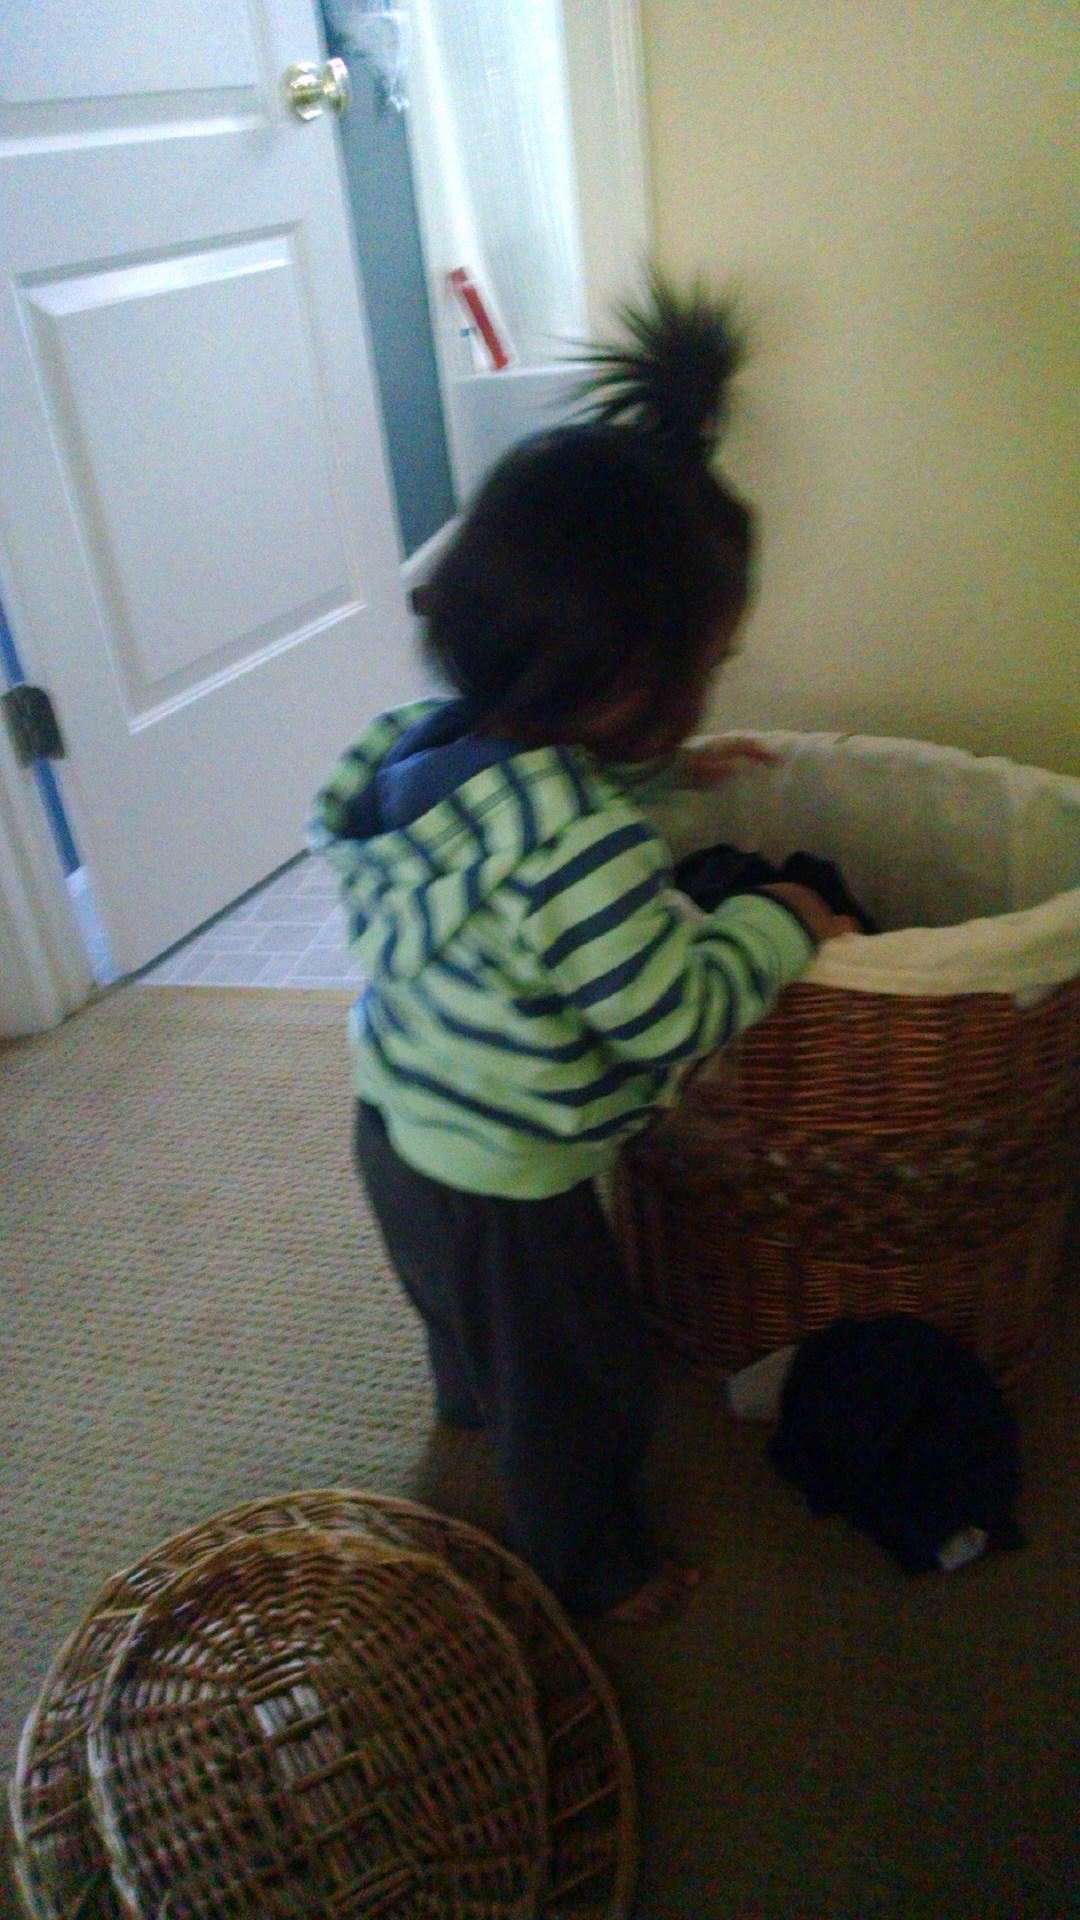 Montessori Toddler Bedroom - Laundry basket